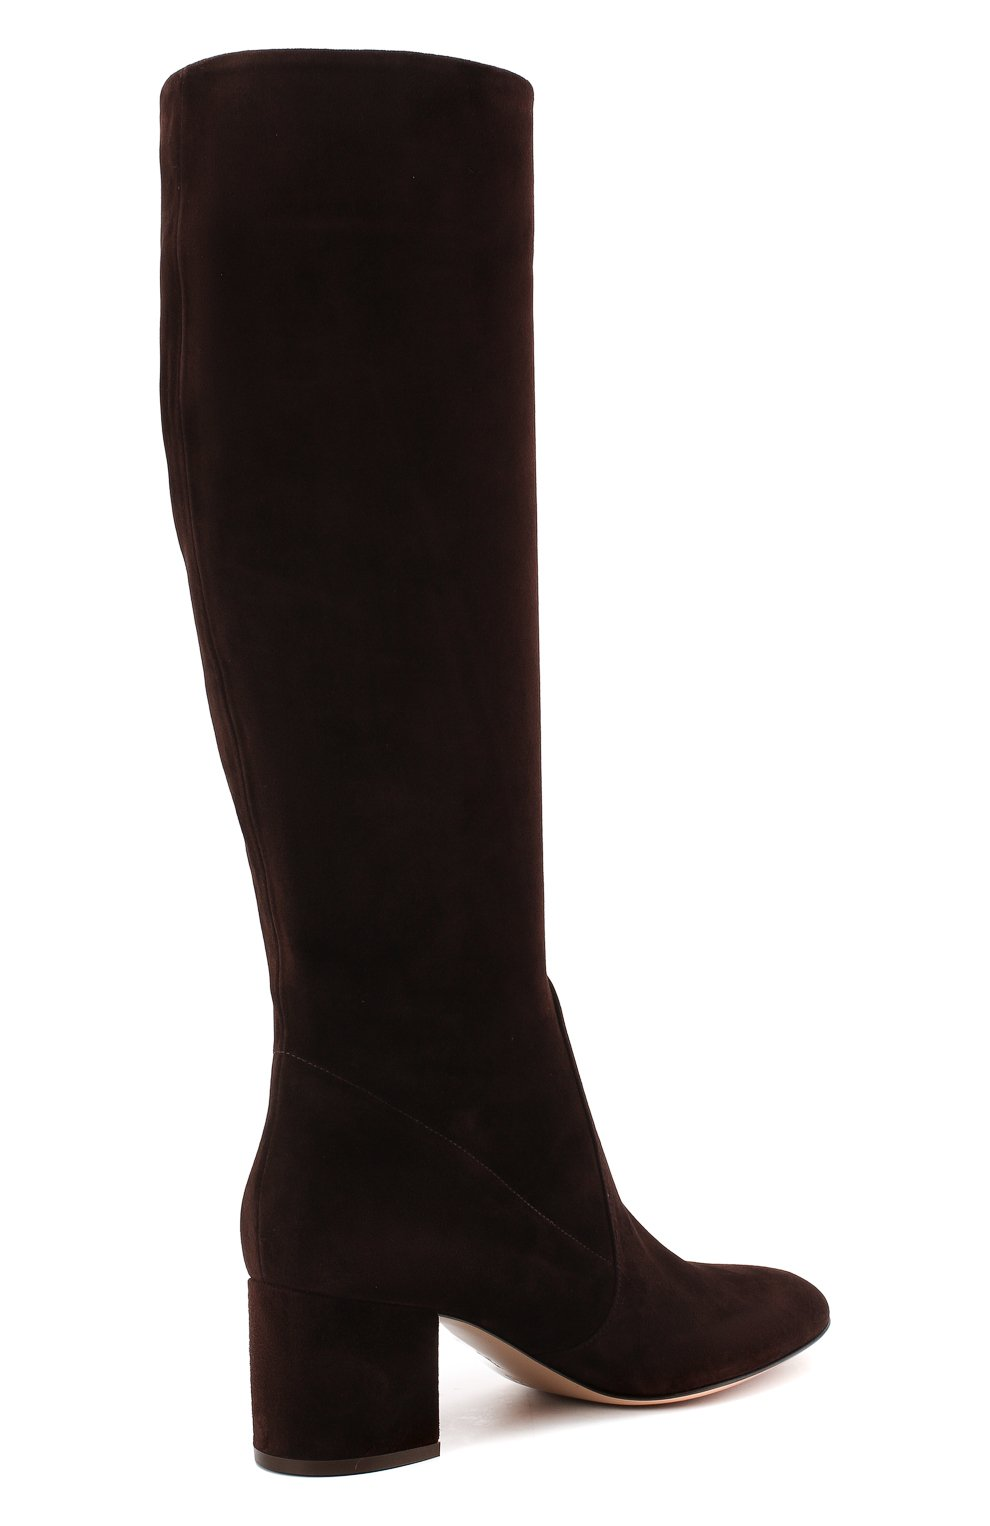 Женские замшевые сапоги daywear GIANVITO ROSSI коричневого цвета, арт. G80401.60RIC.C45W00D | Фото 4